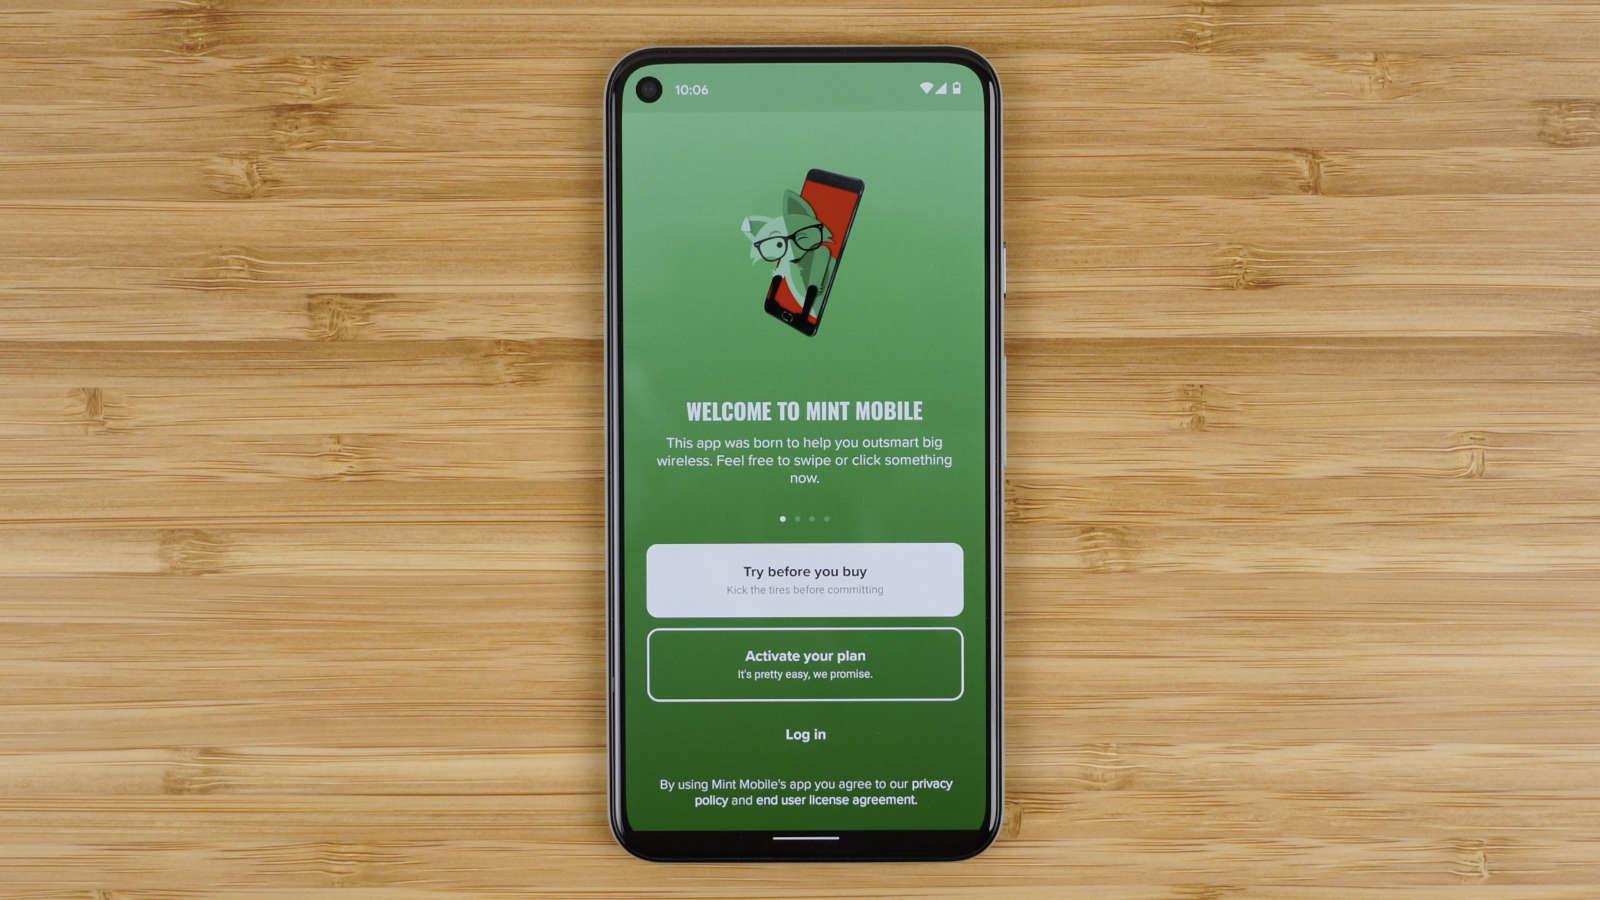 Mint Mobile app launch screen